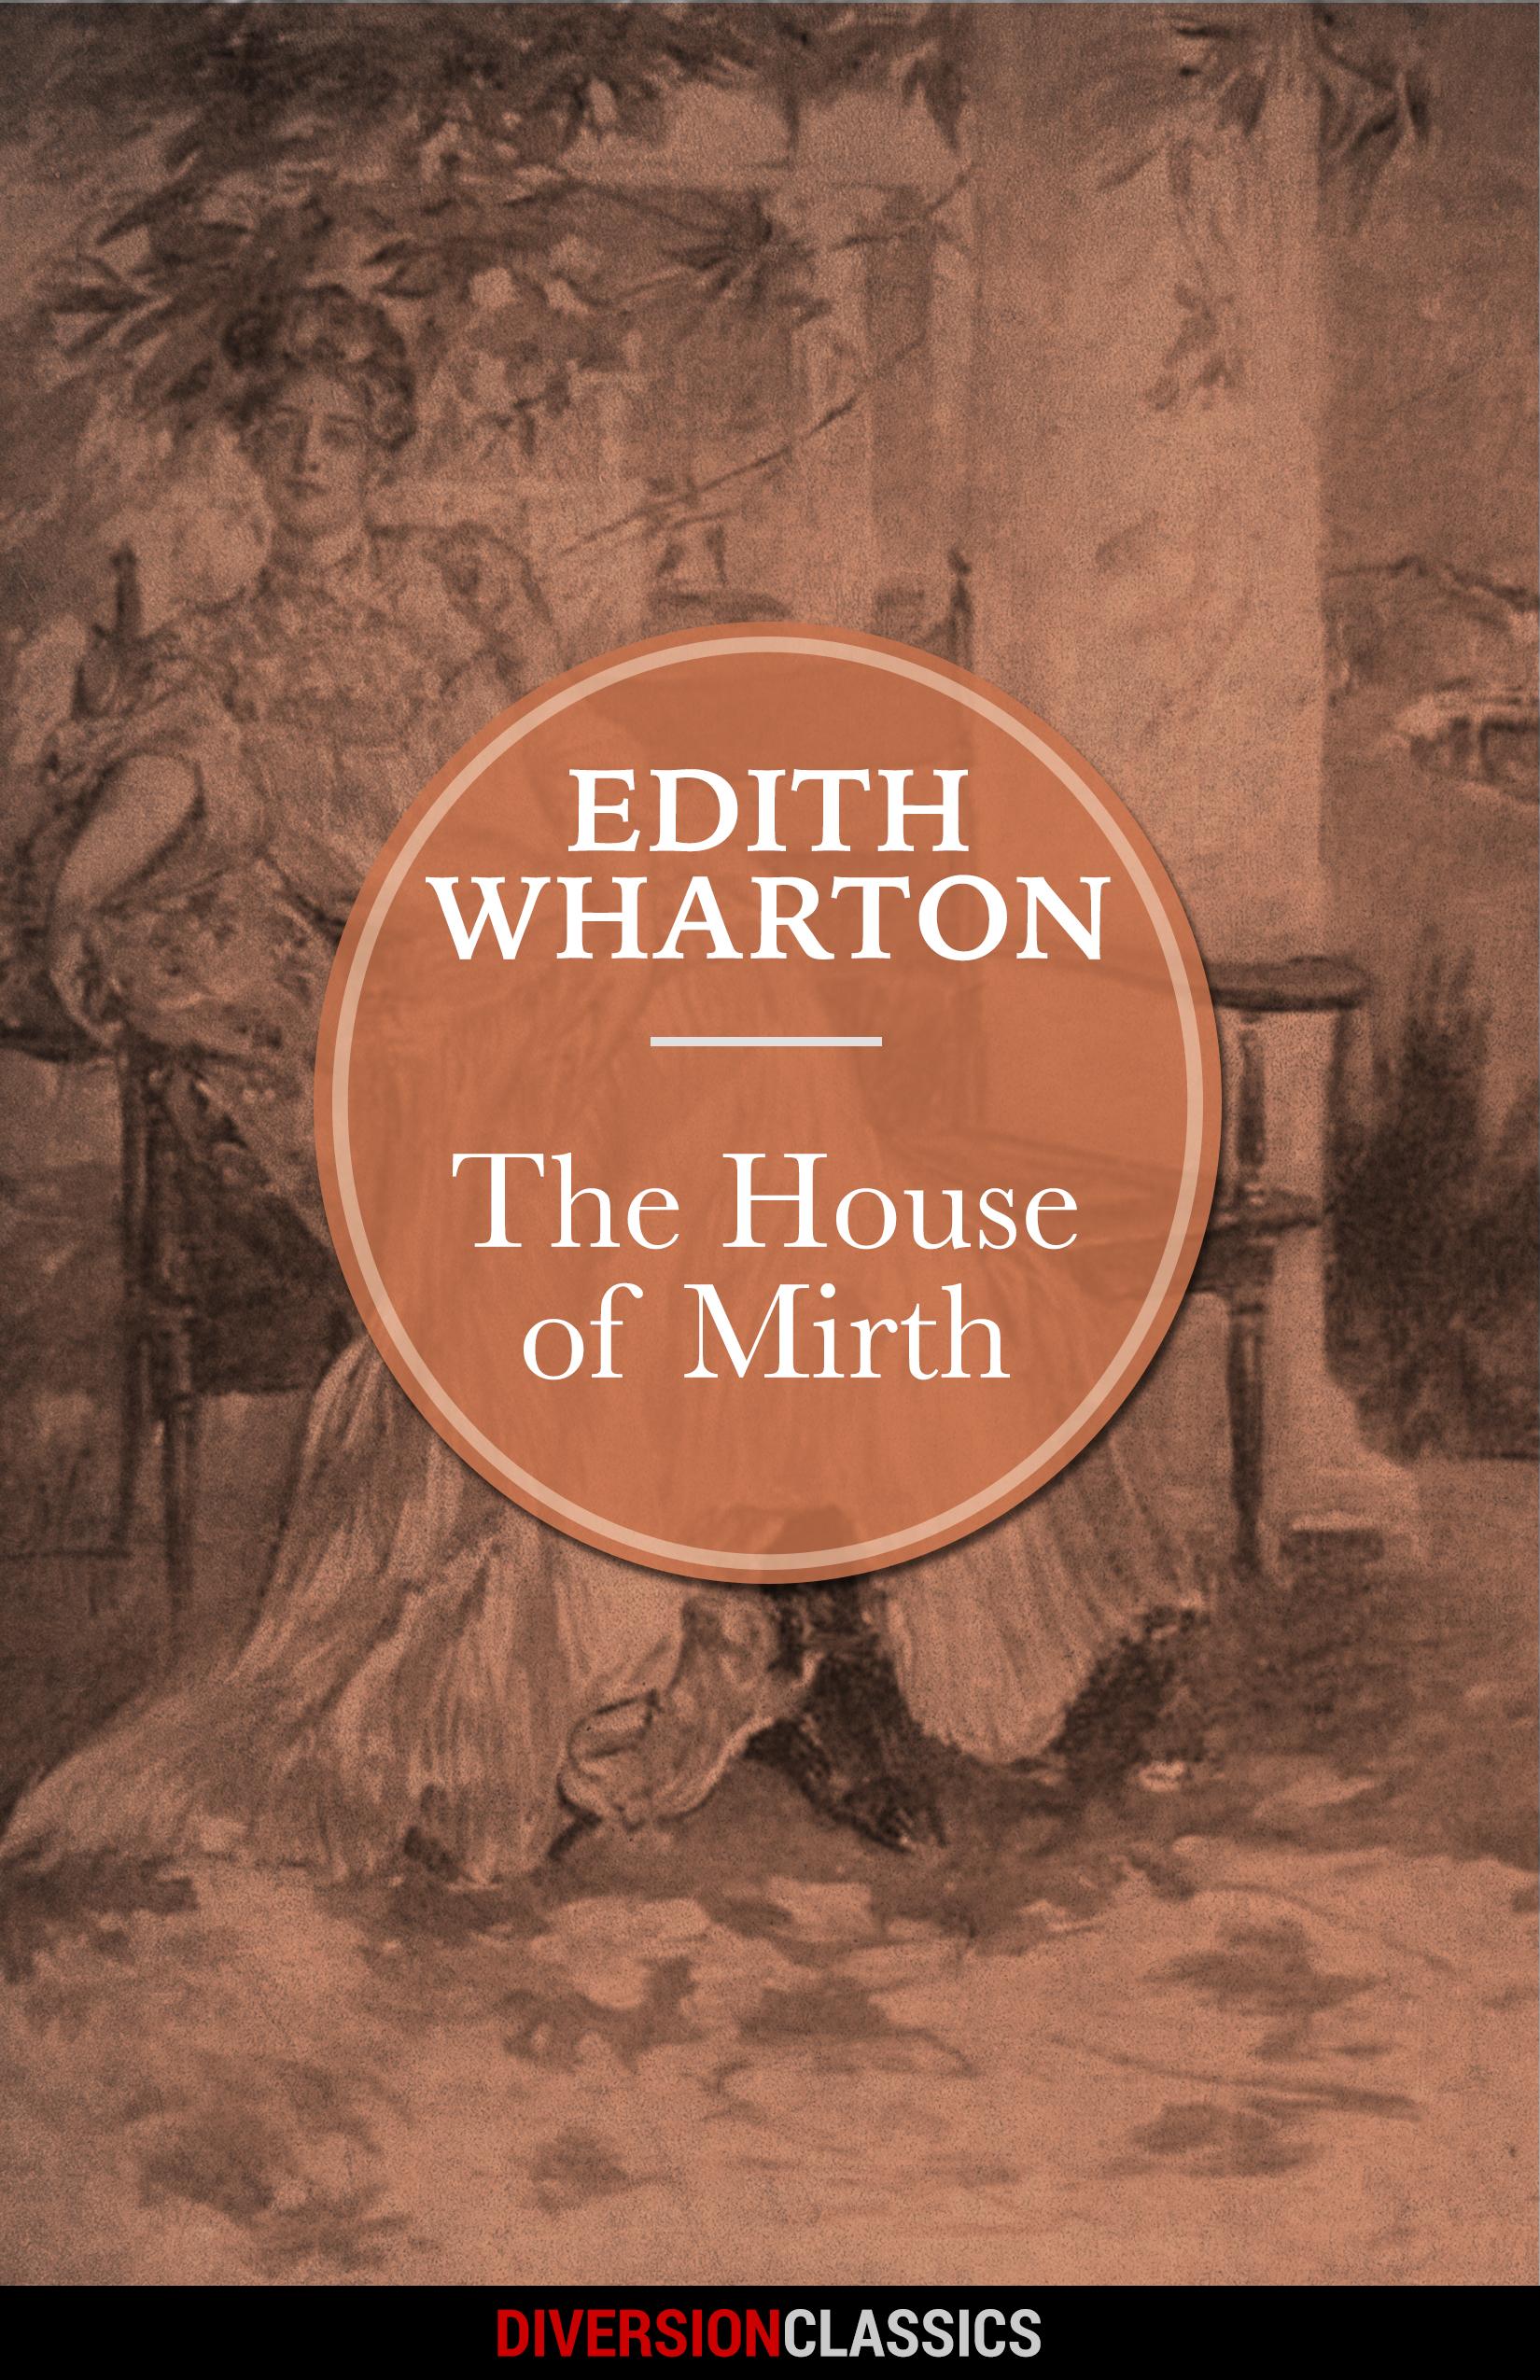 edith whartons the house of mi essay